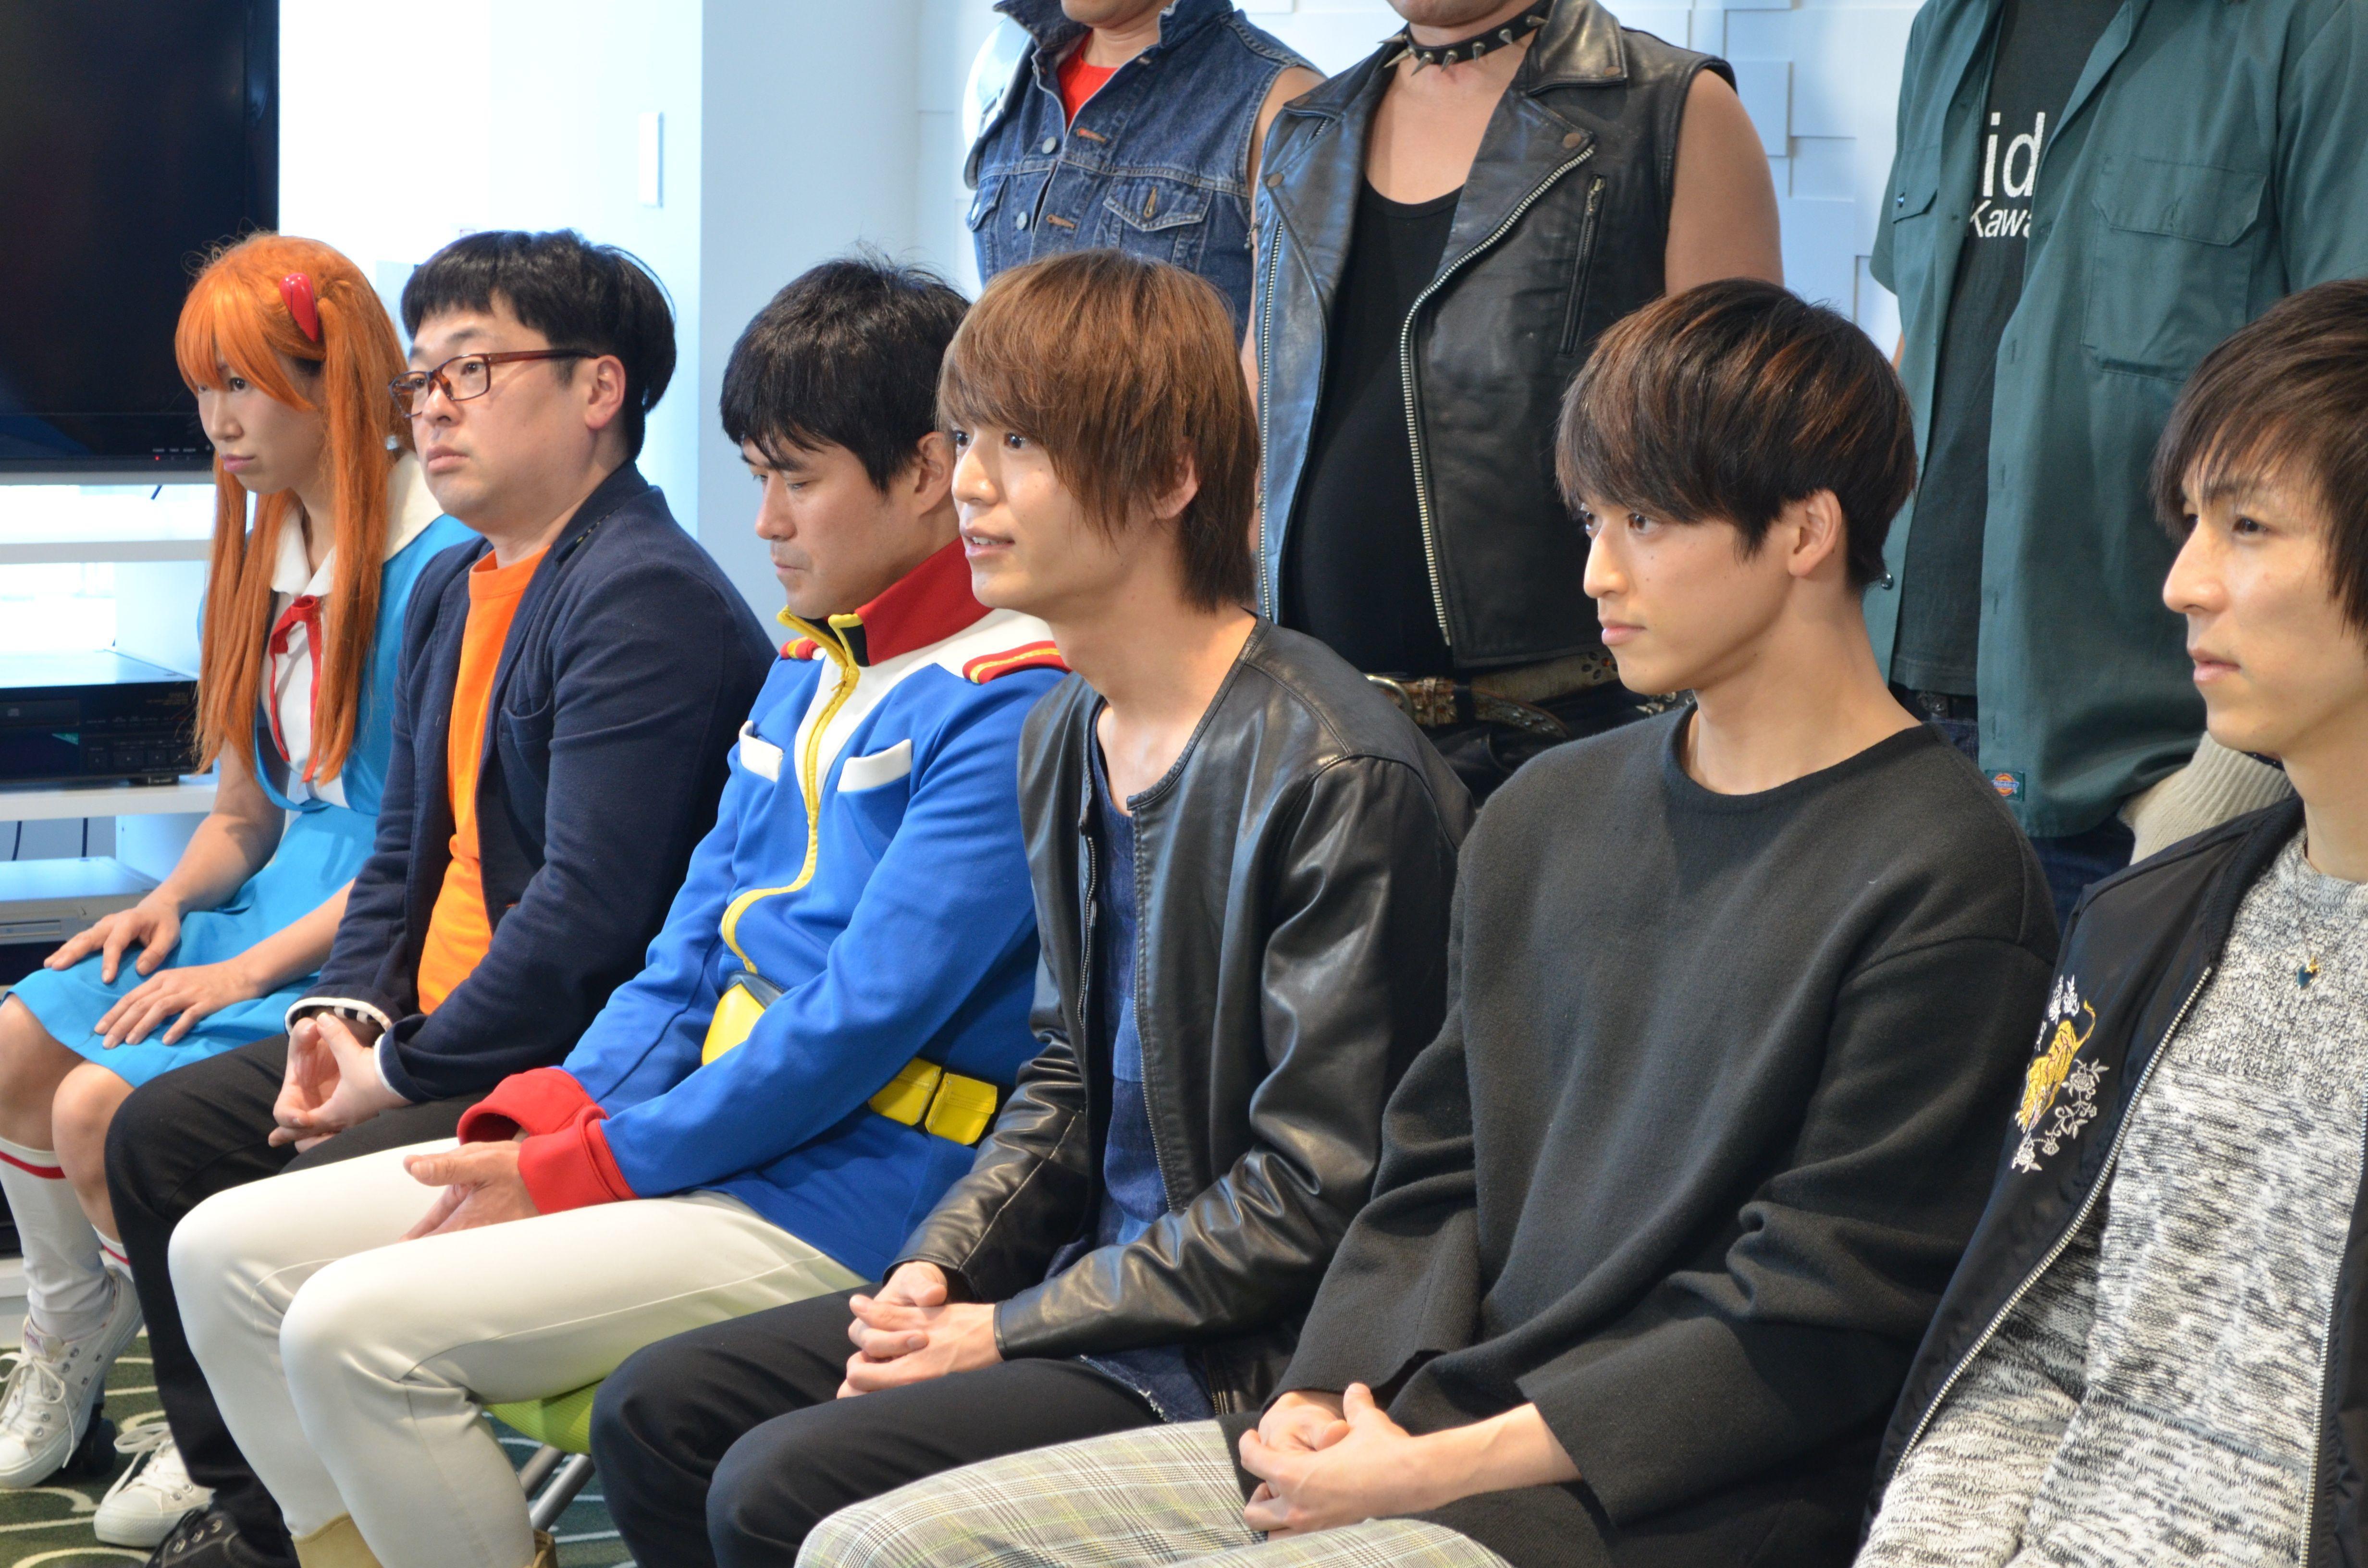 http://news.yoshimoto.co.jp/20180316233214-08cbbeb5877ae6ccdd02c71121f22556dd948ac1.jpg